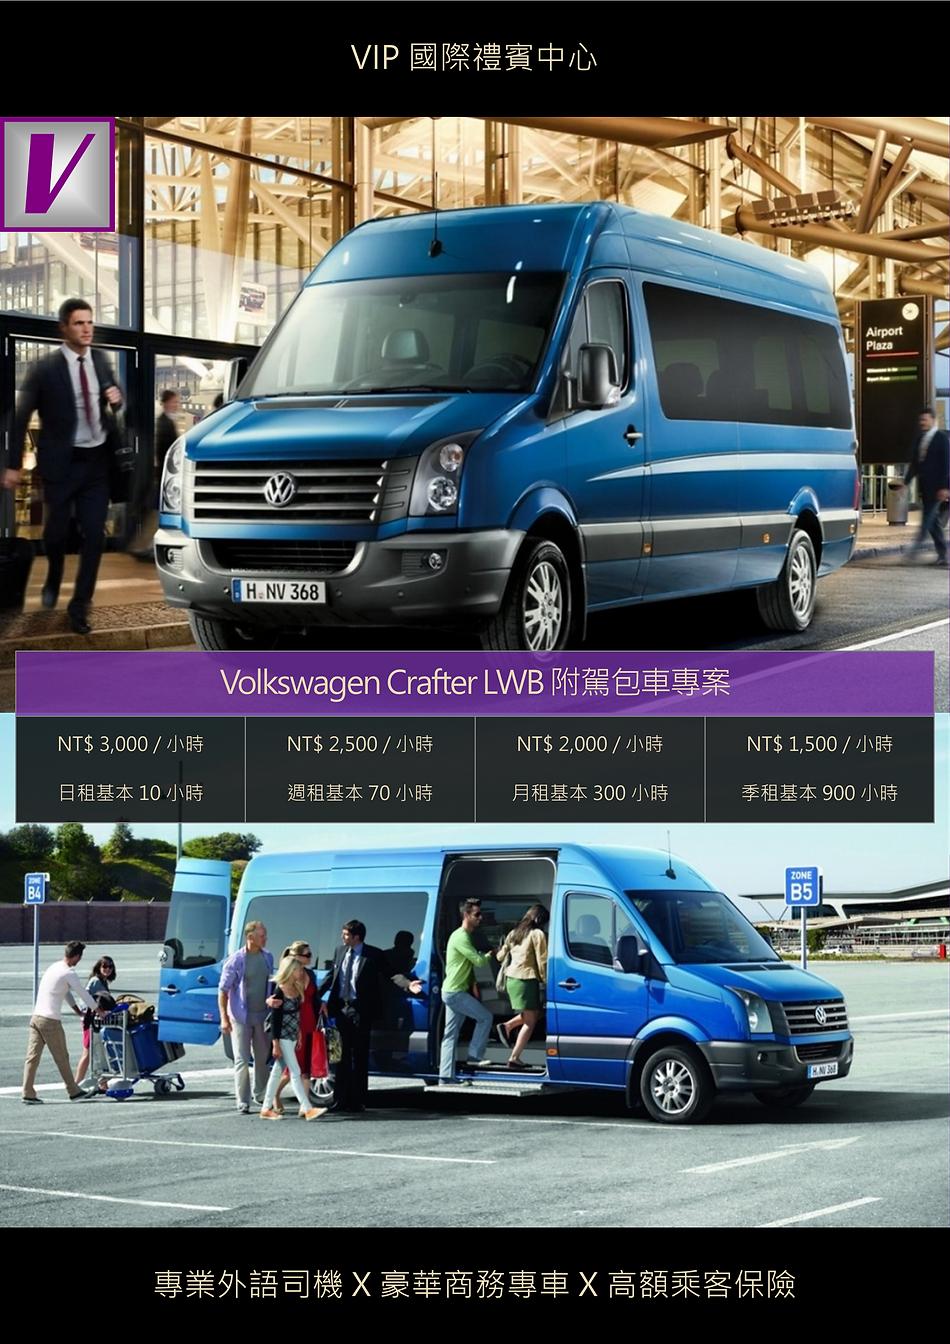 VIP國際禮賓中心 VOLKSWAGEN CRAFTER LWB 附駕包車專案 DM.png